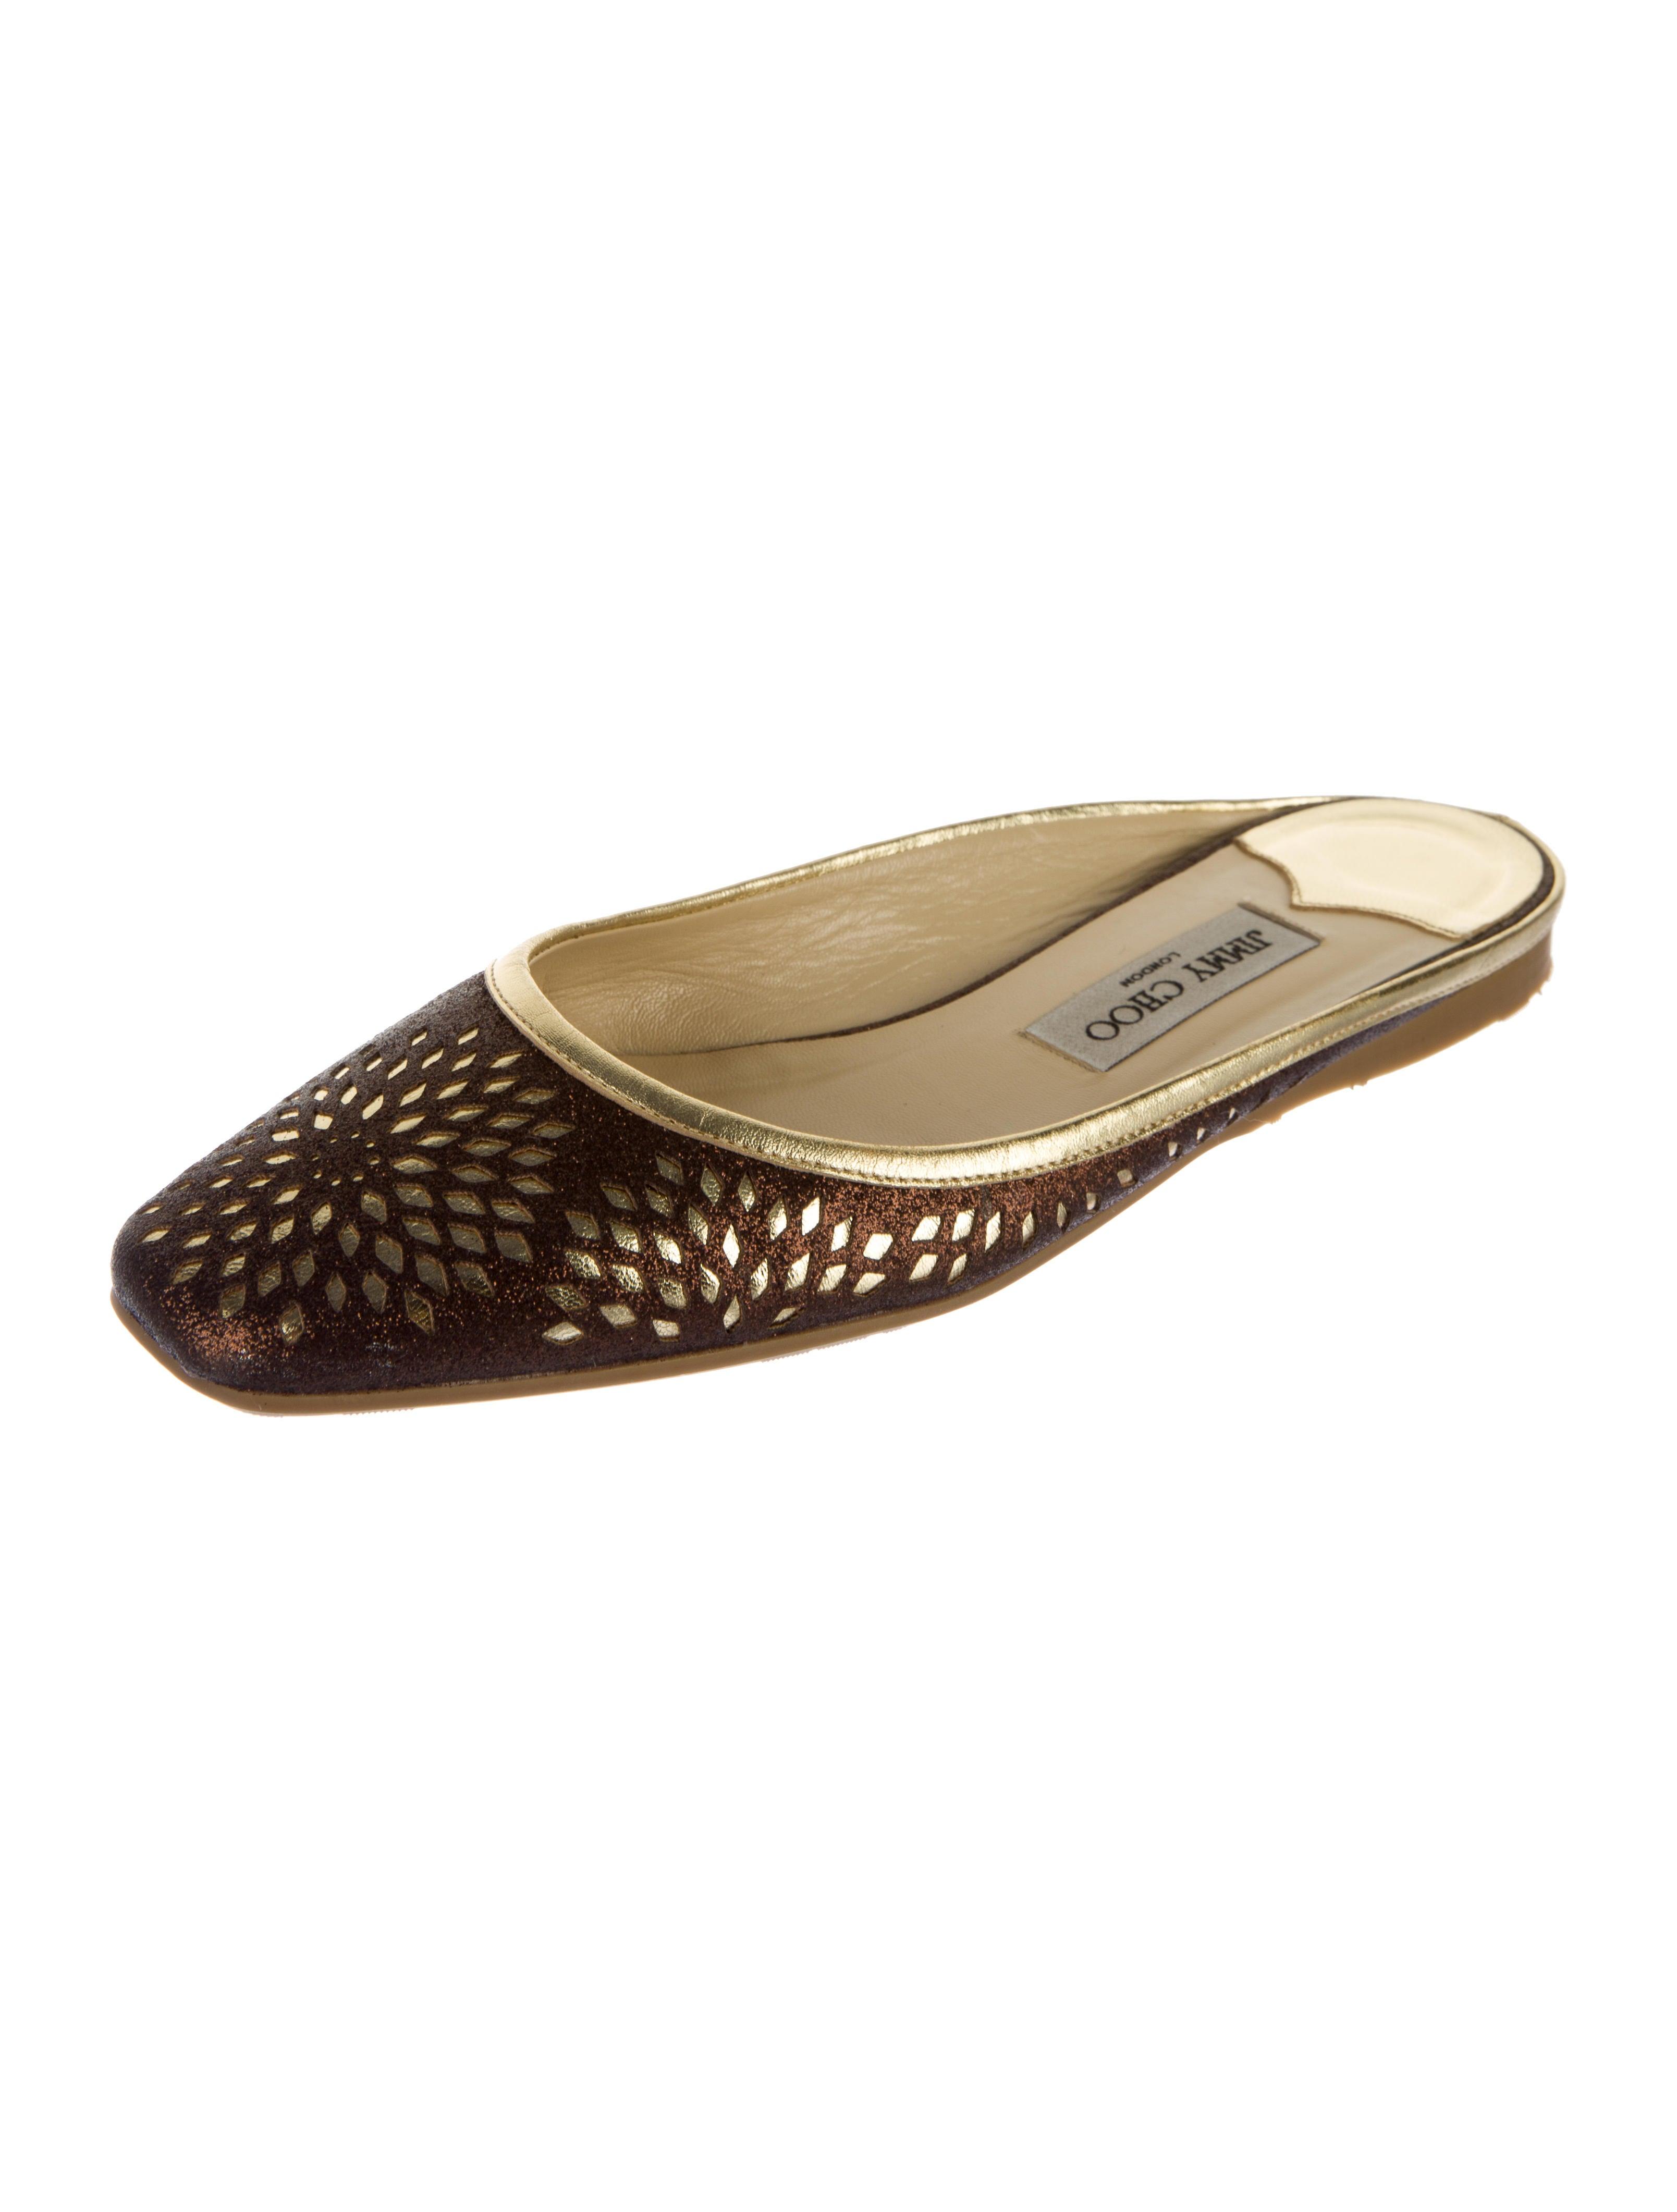 Momo Shoes Sale